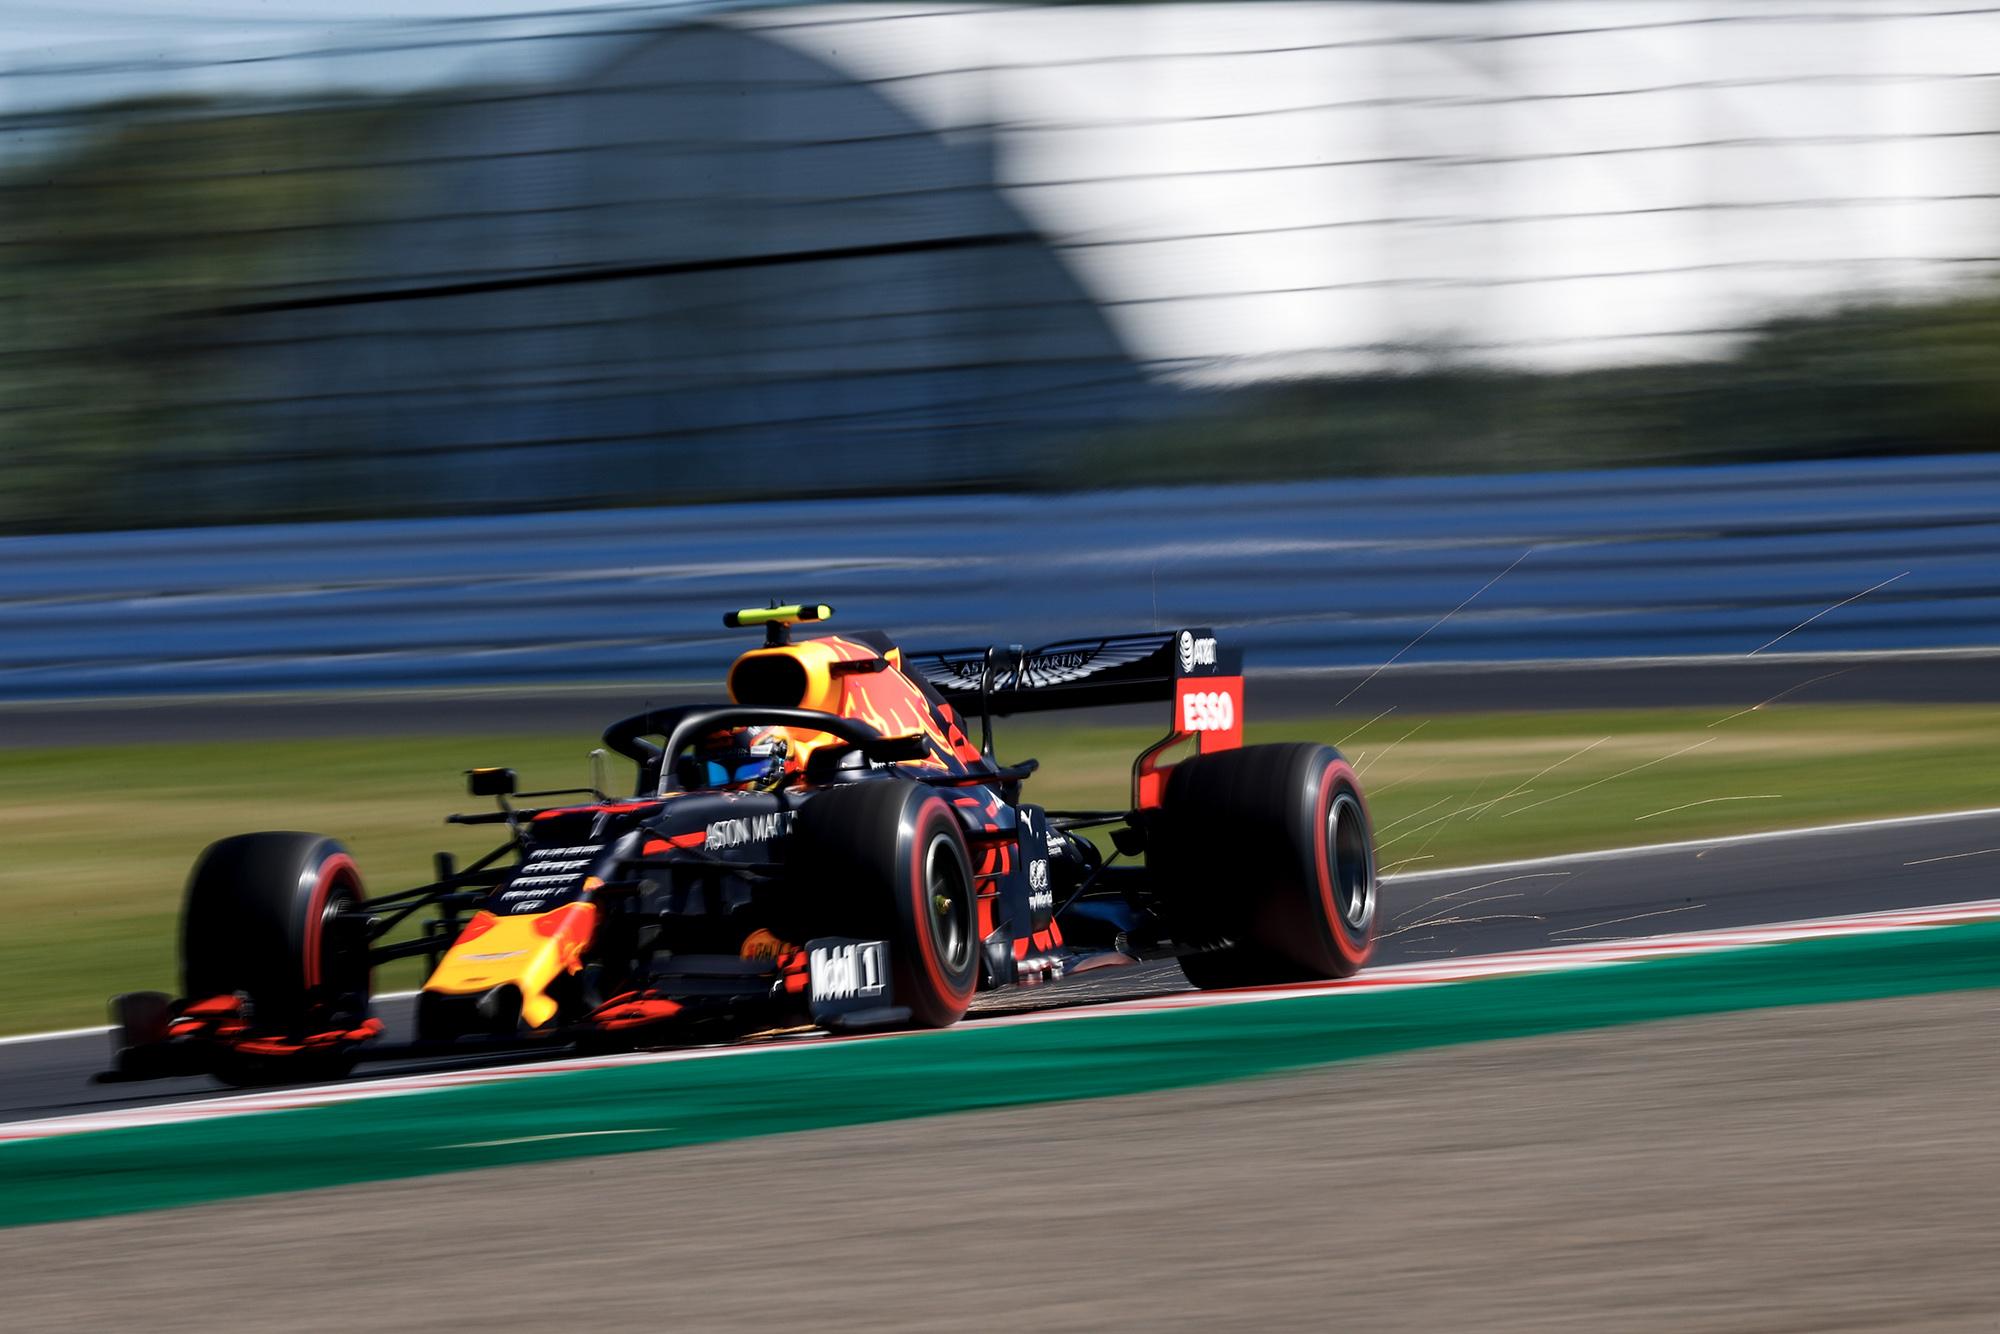 Alex Albon qualifying for the 2019 F1 Japanese Grand Prix